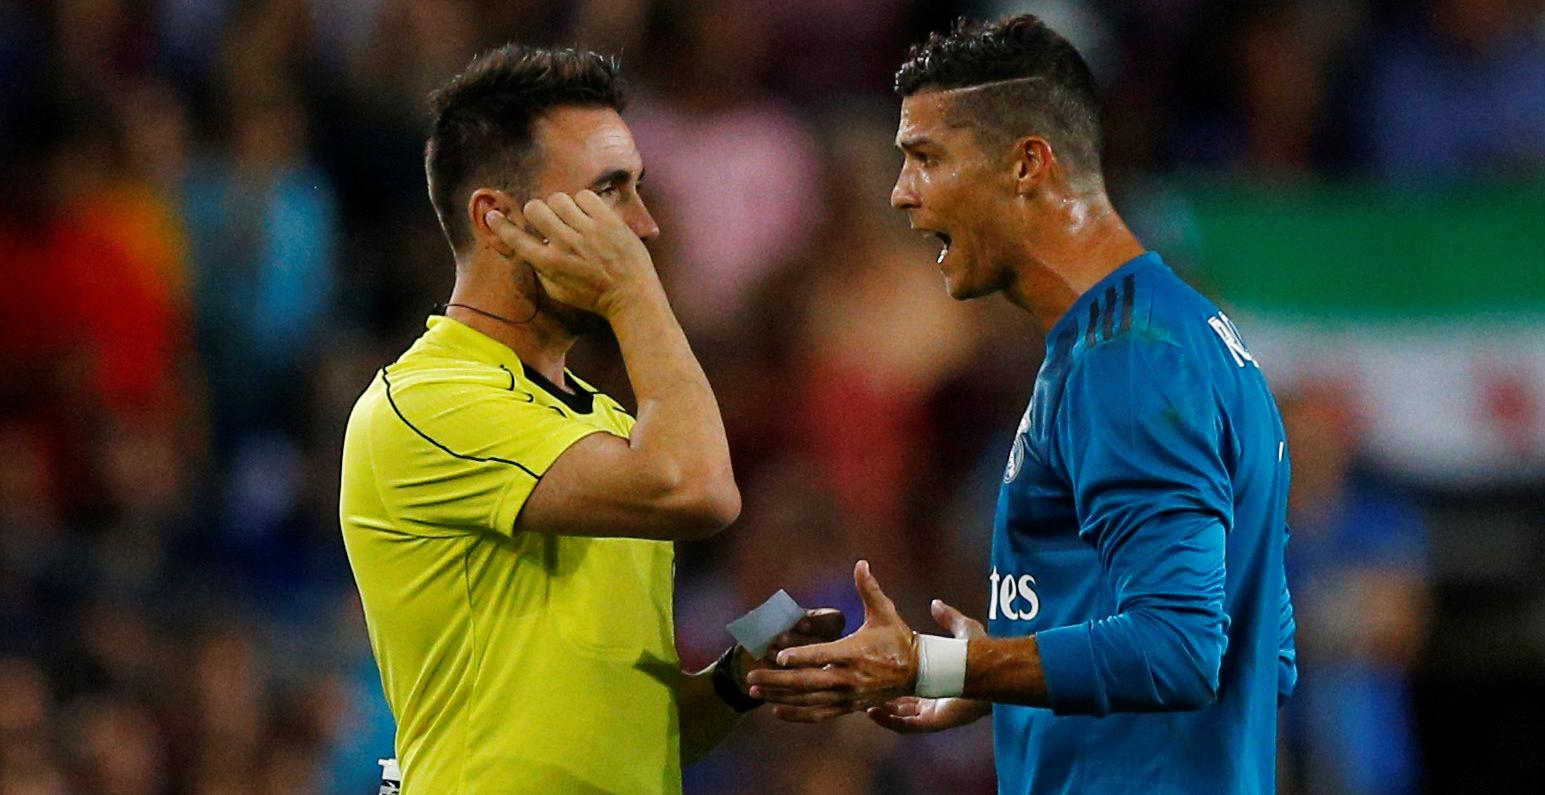 Apelación ratifica los cinco partidos de sanción a Cristiano Ronaldo